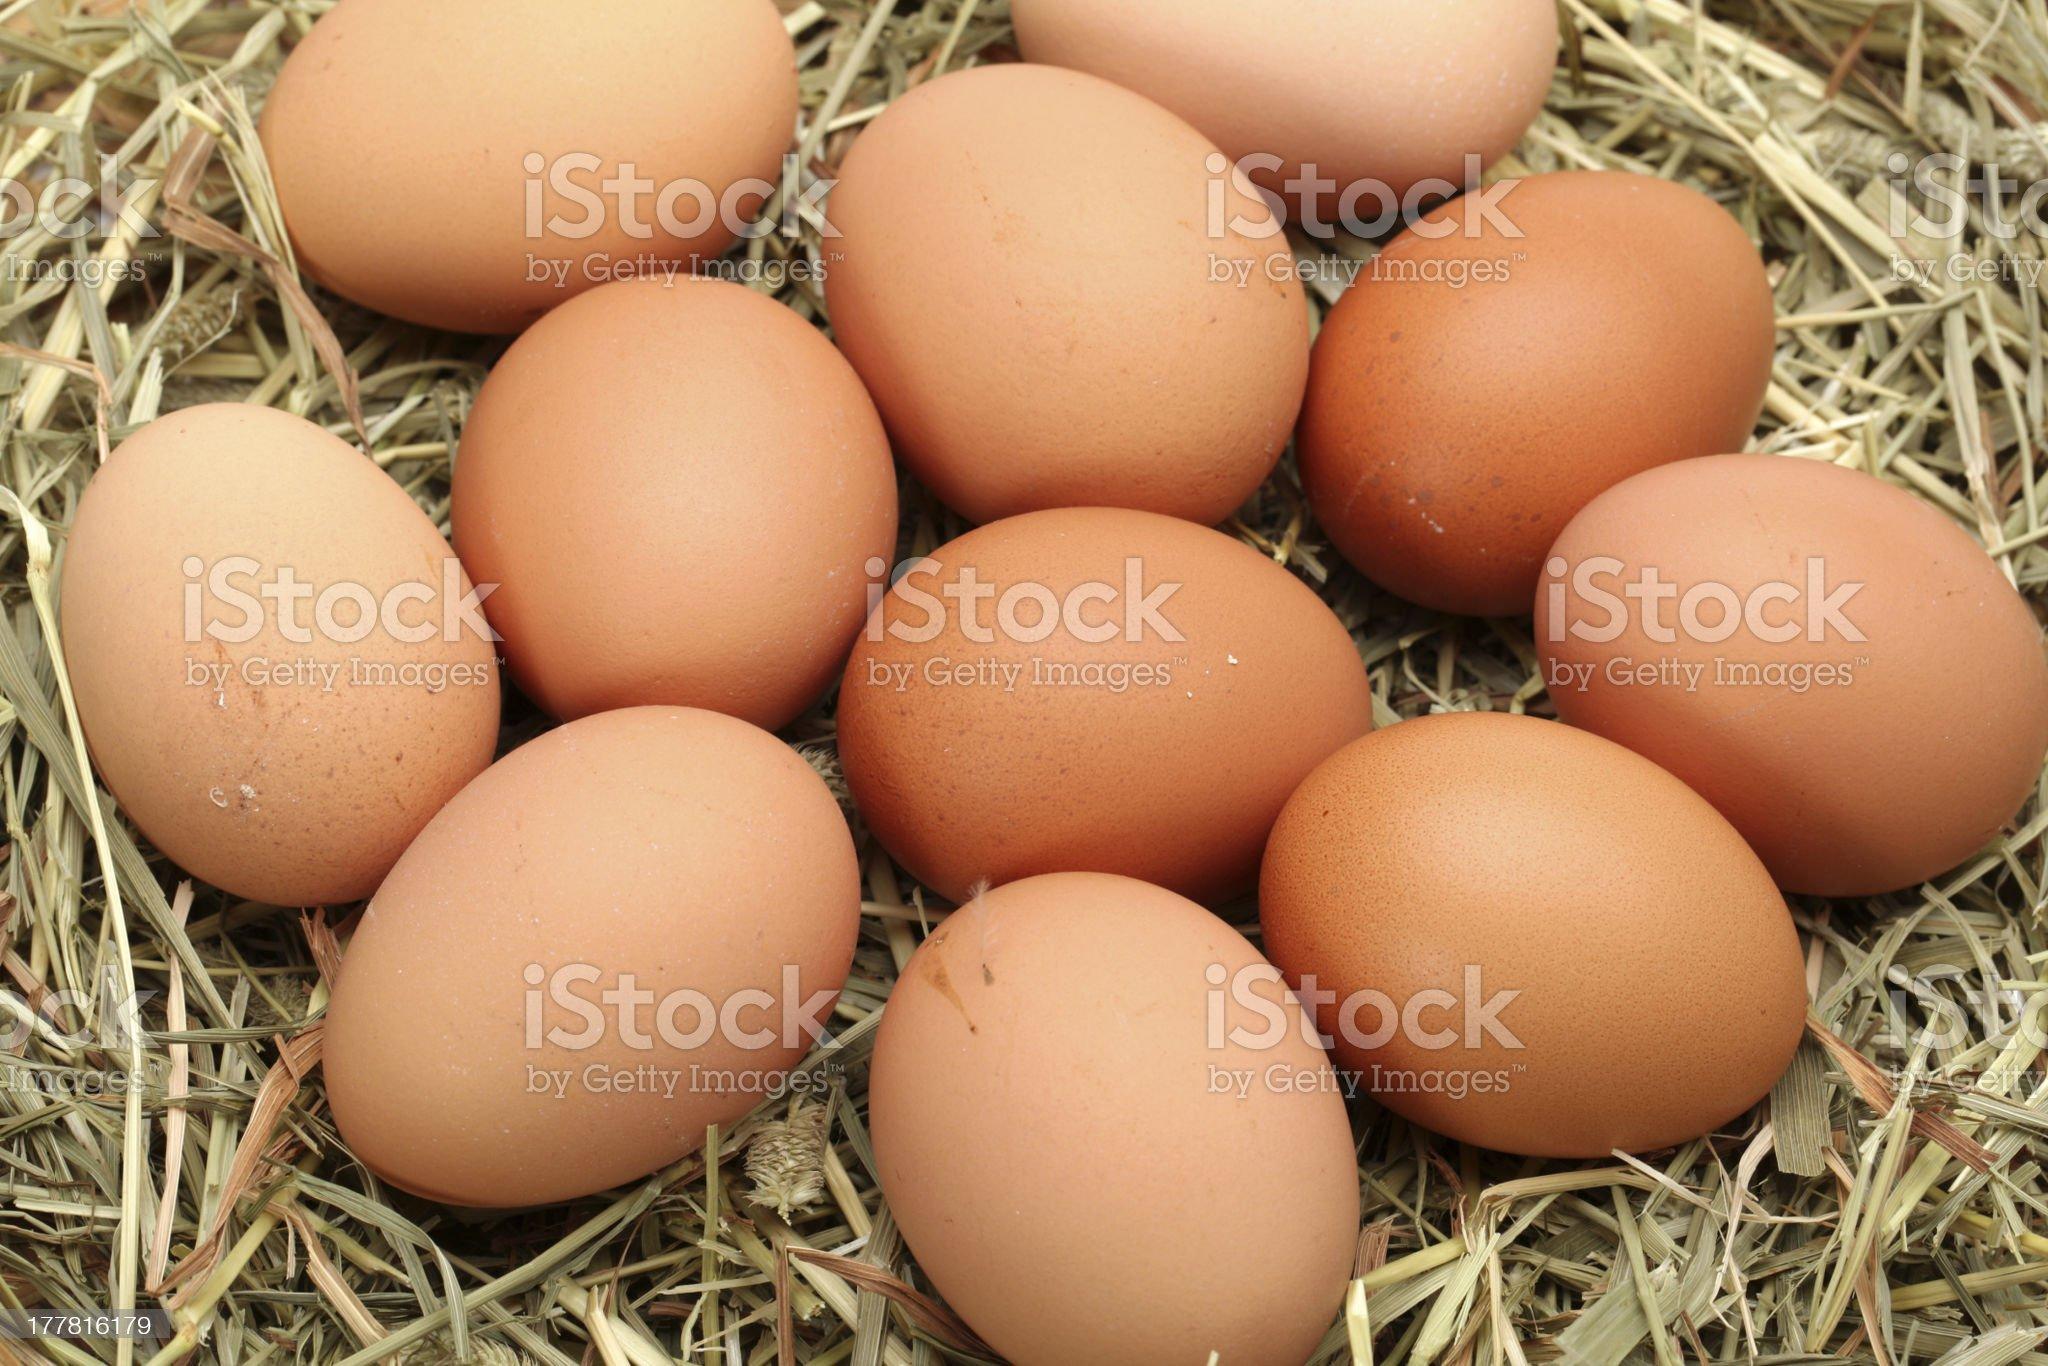 eggs royalty-free stock photo